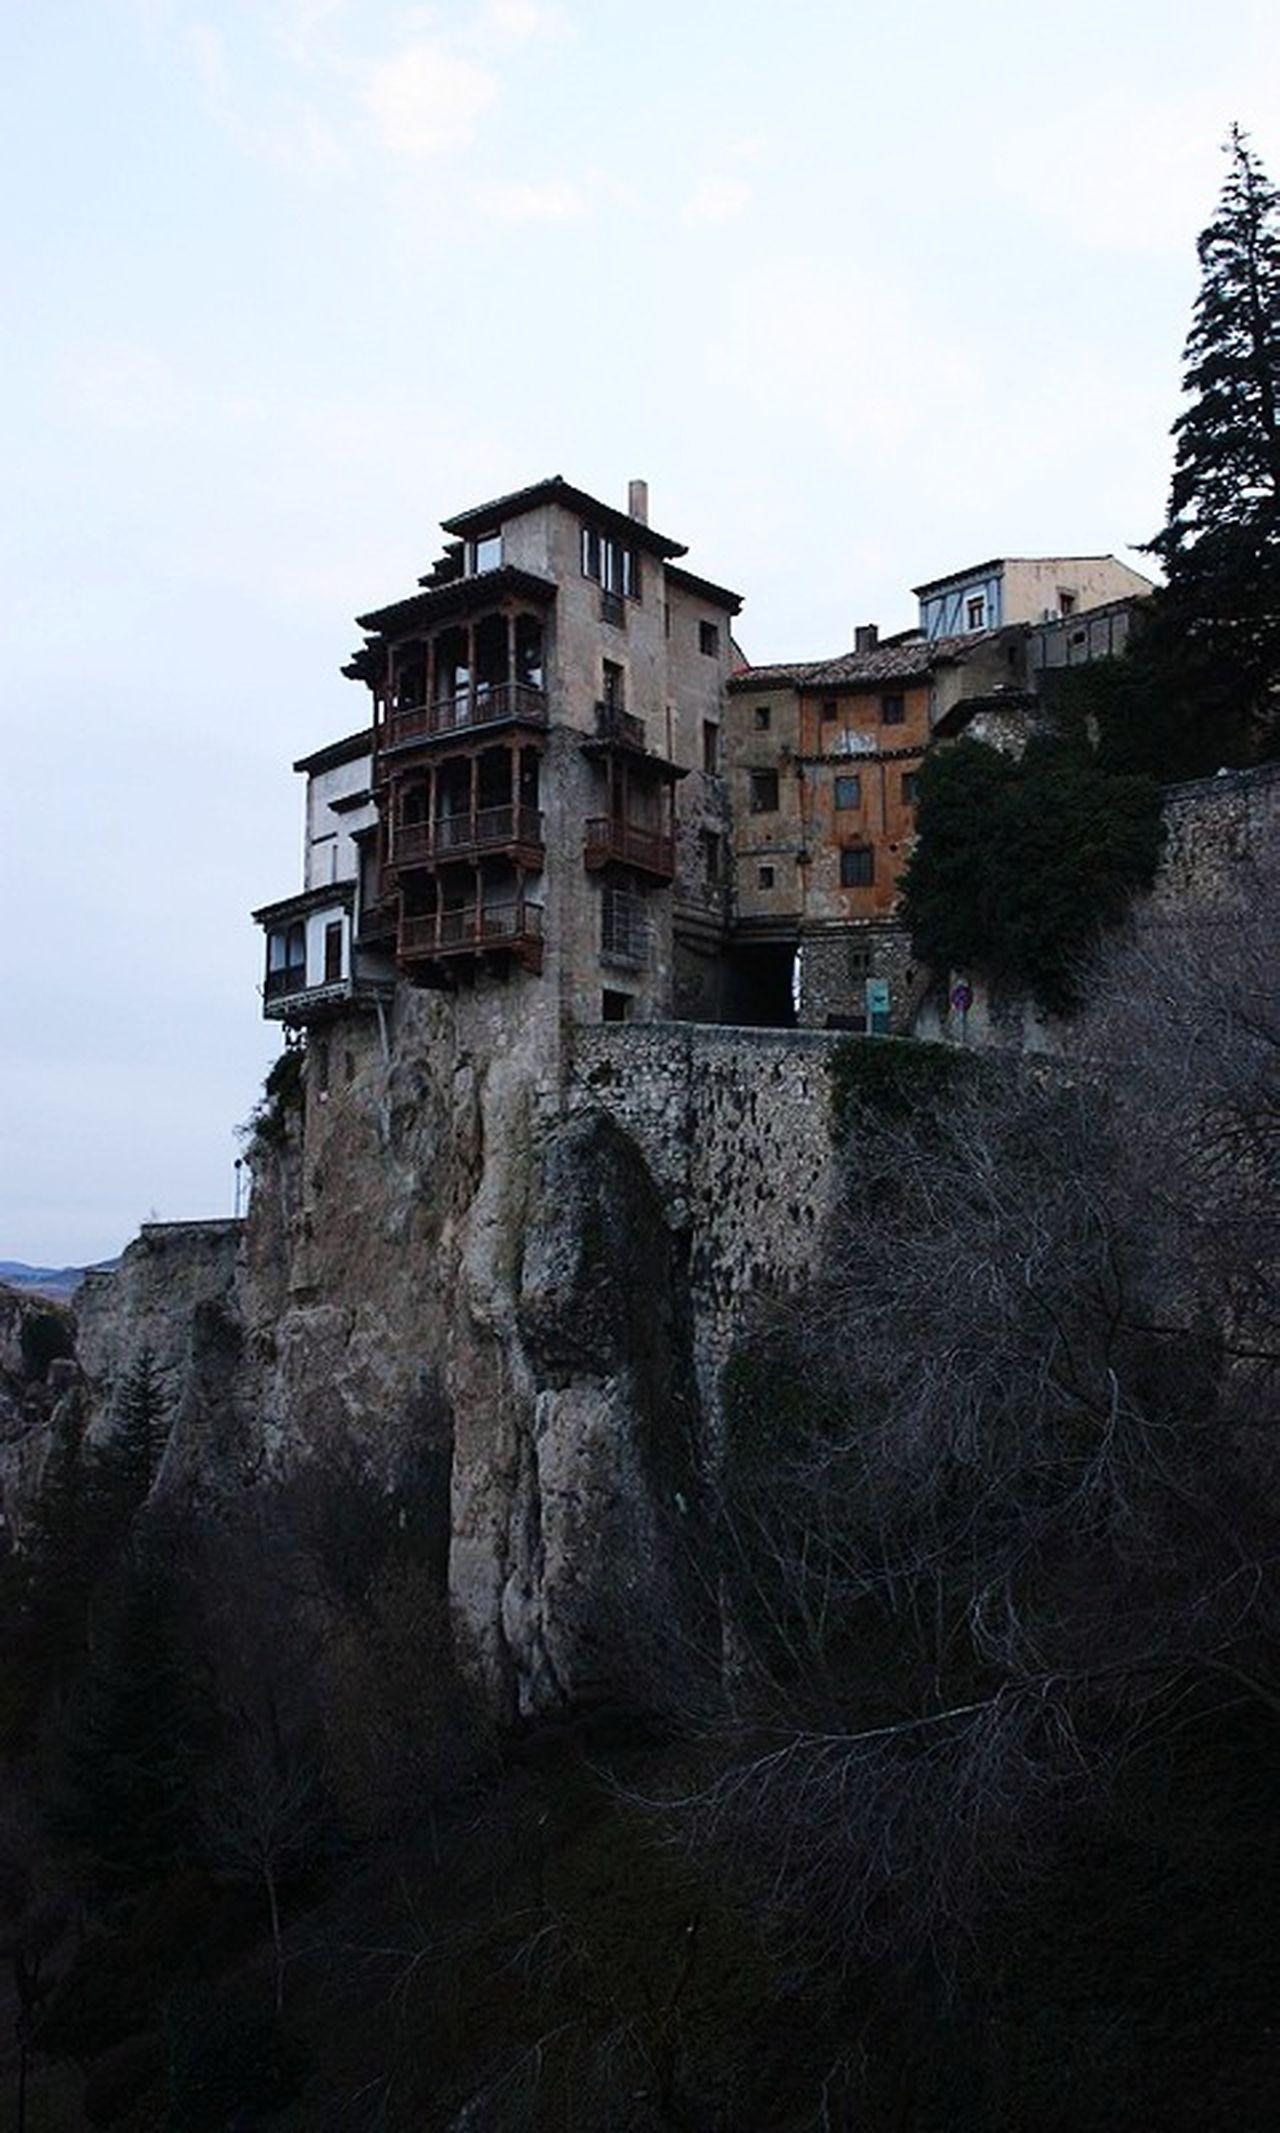 Cuenca Cuenca, Spain Casas Colgadas Colgada  SPAIN Spainish EyeEm Spain Made In Spain España Espagne